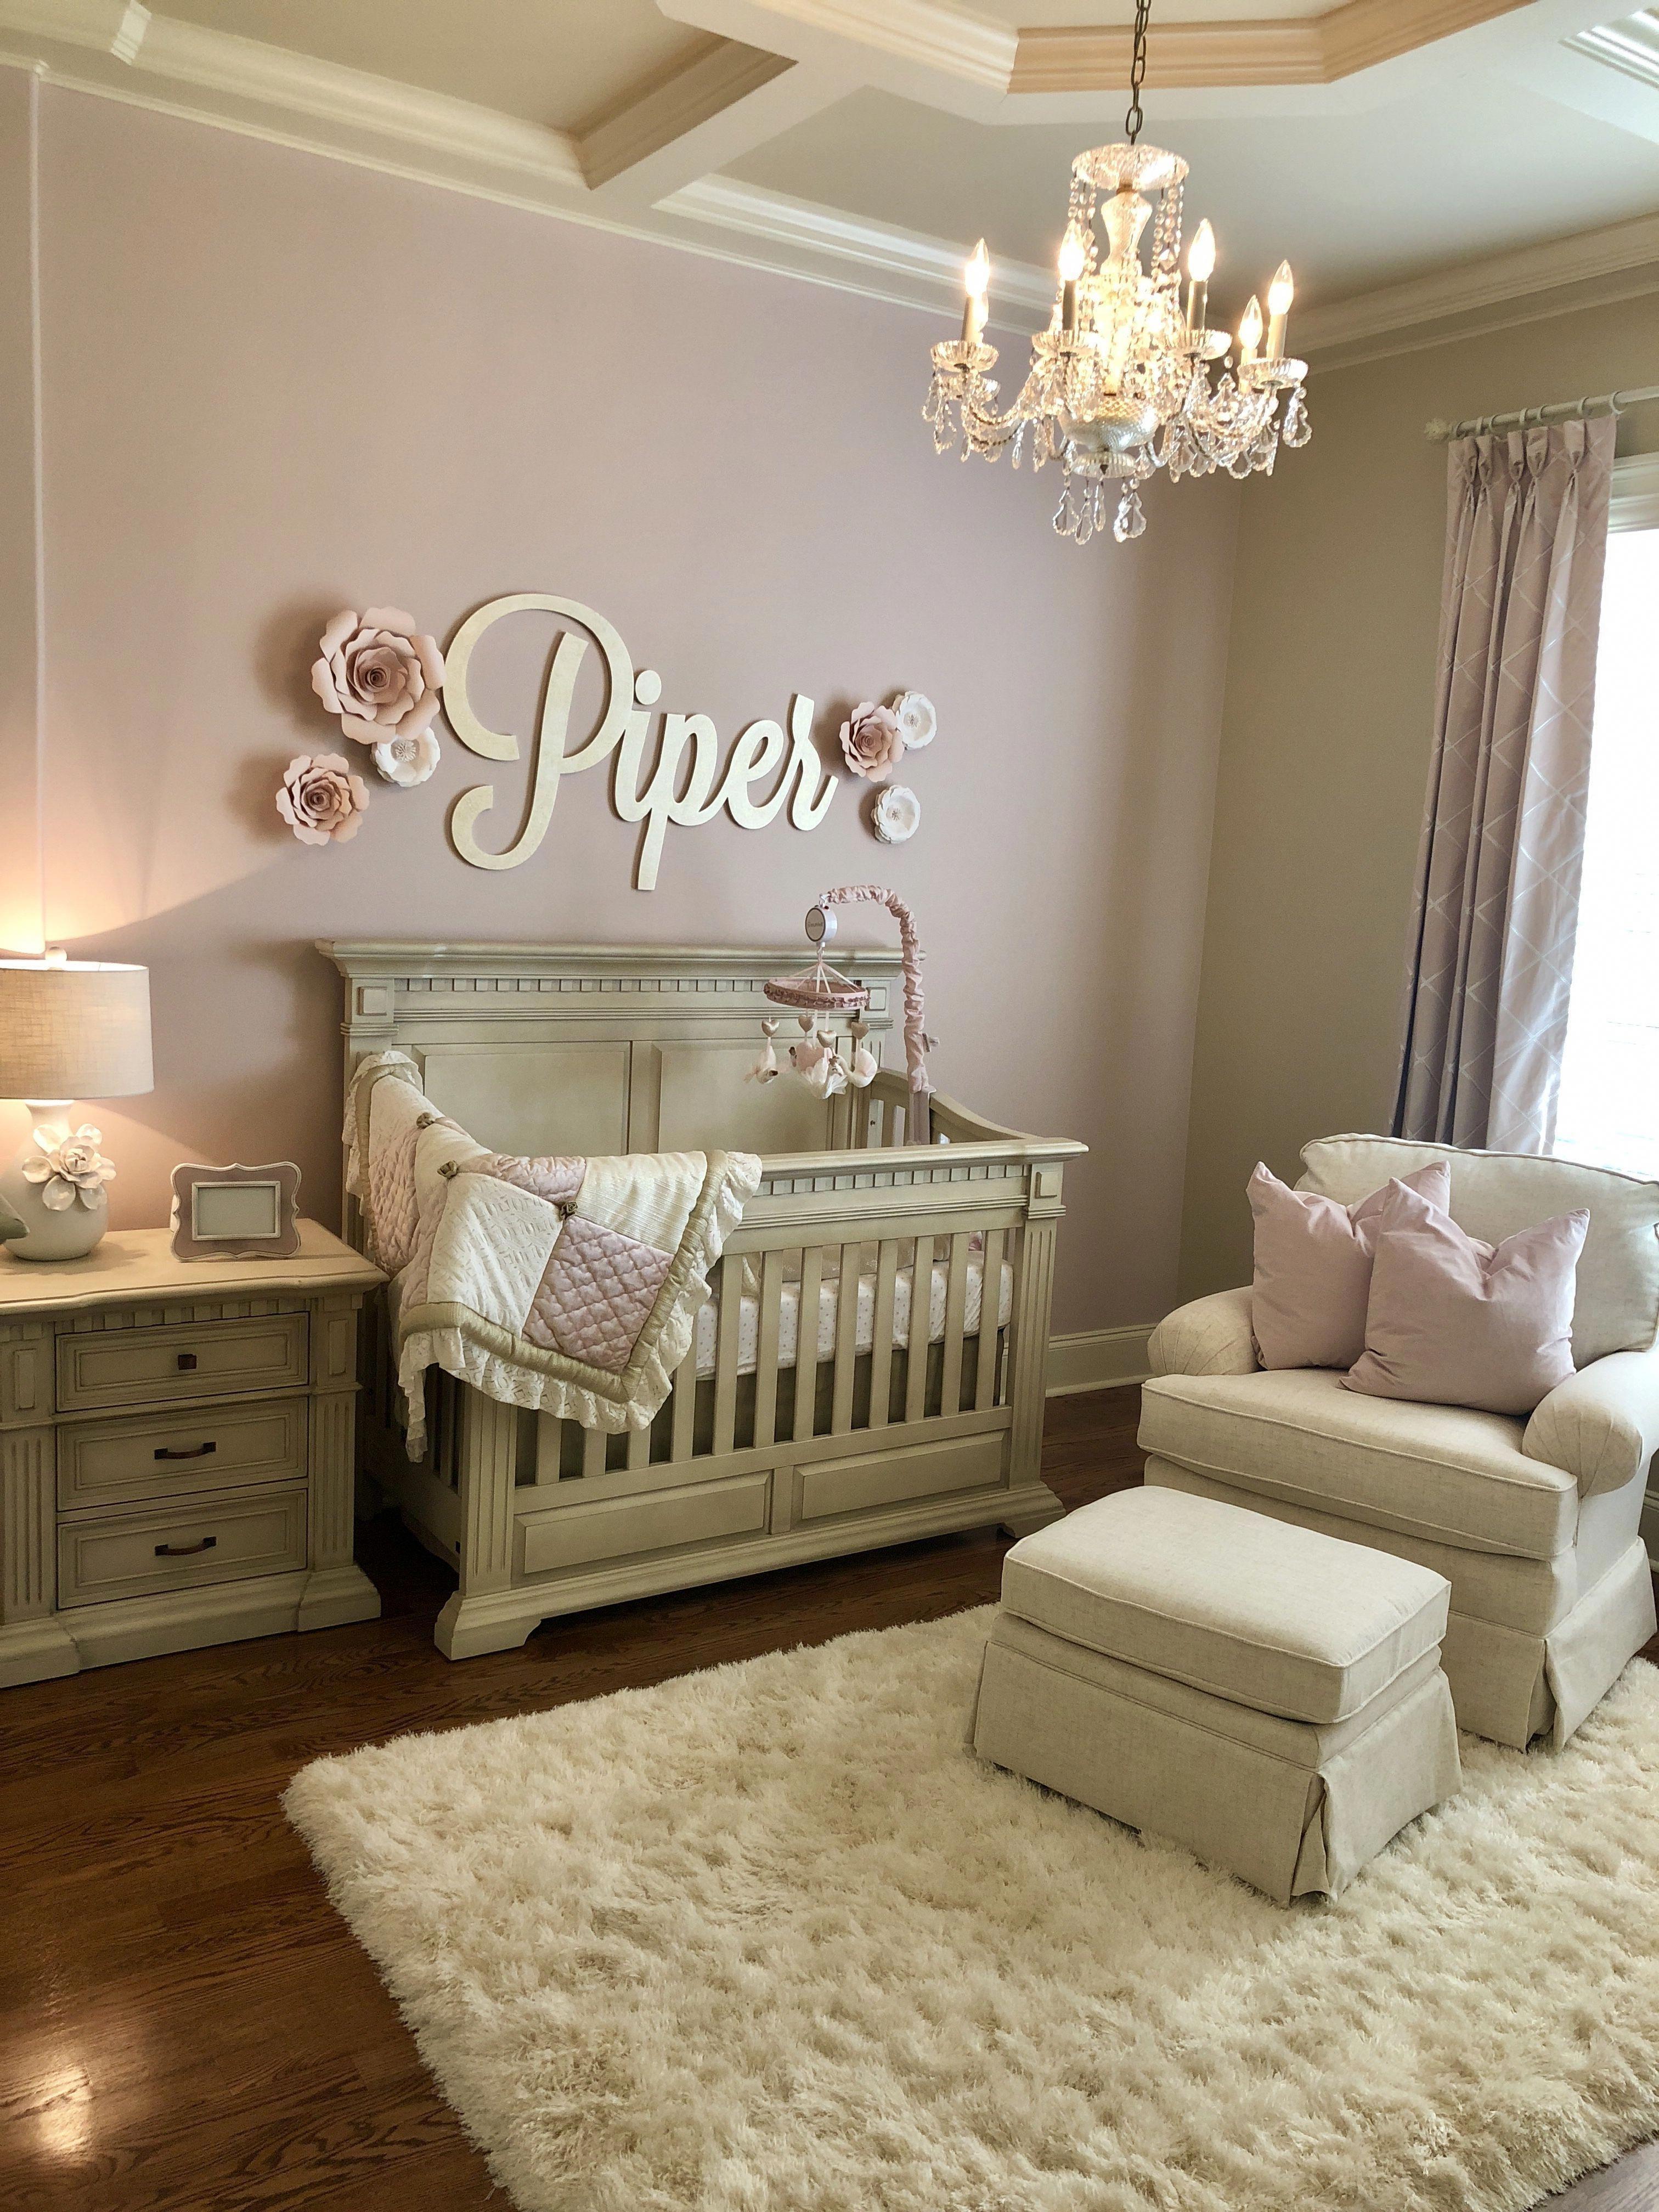 50 Inspiring Nursery Ideas for Your Baby Girl Cute